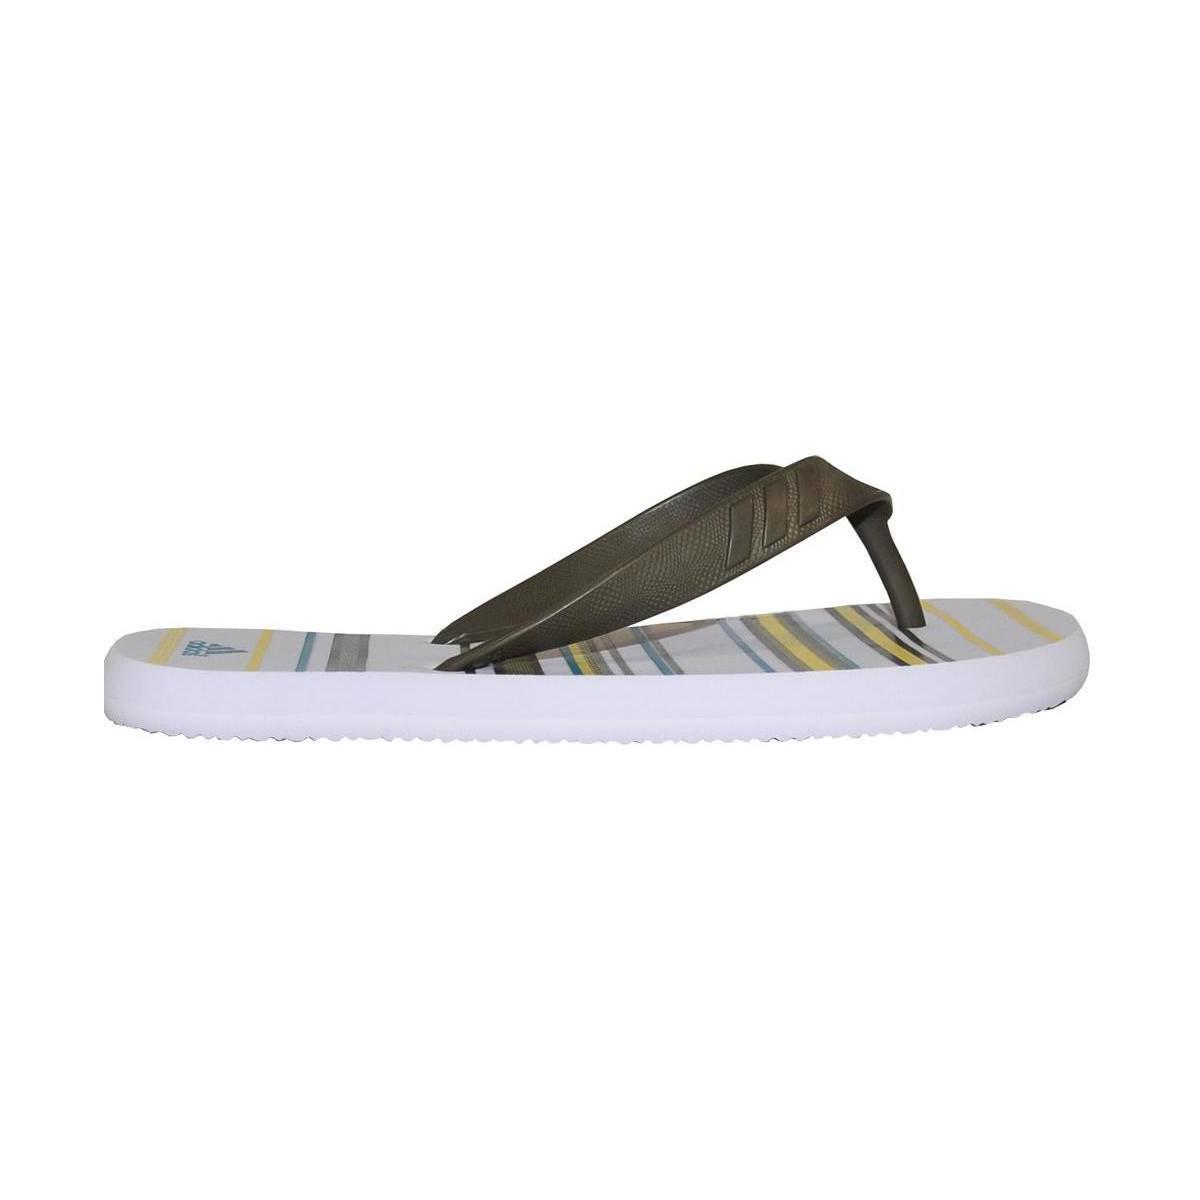 8be955979 adidas Juuvi St W Women s Flip Flops   Sandals (shoes) In Green in ...